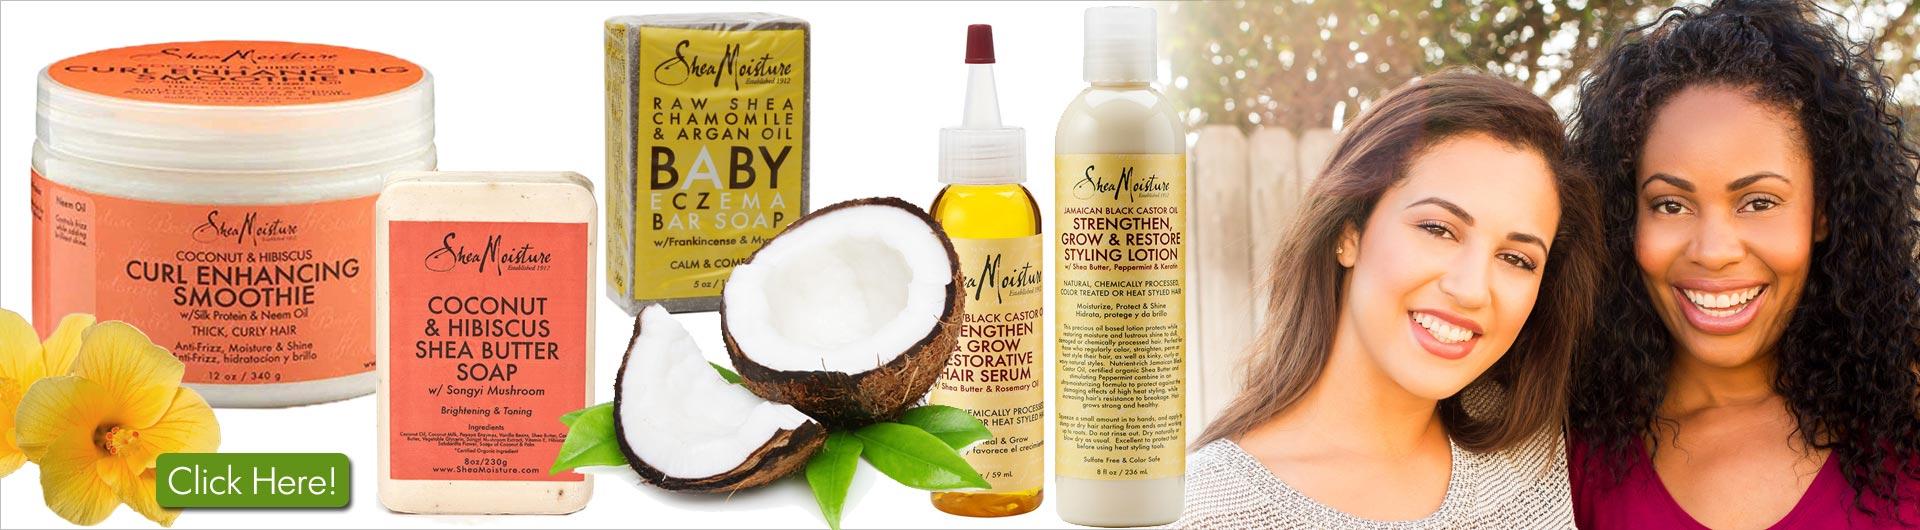 SheaMoisture beauty products